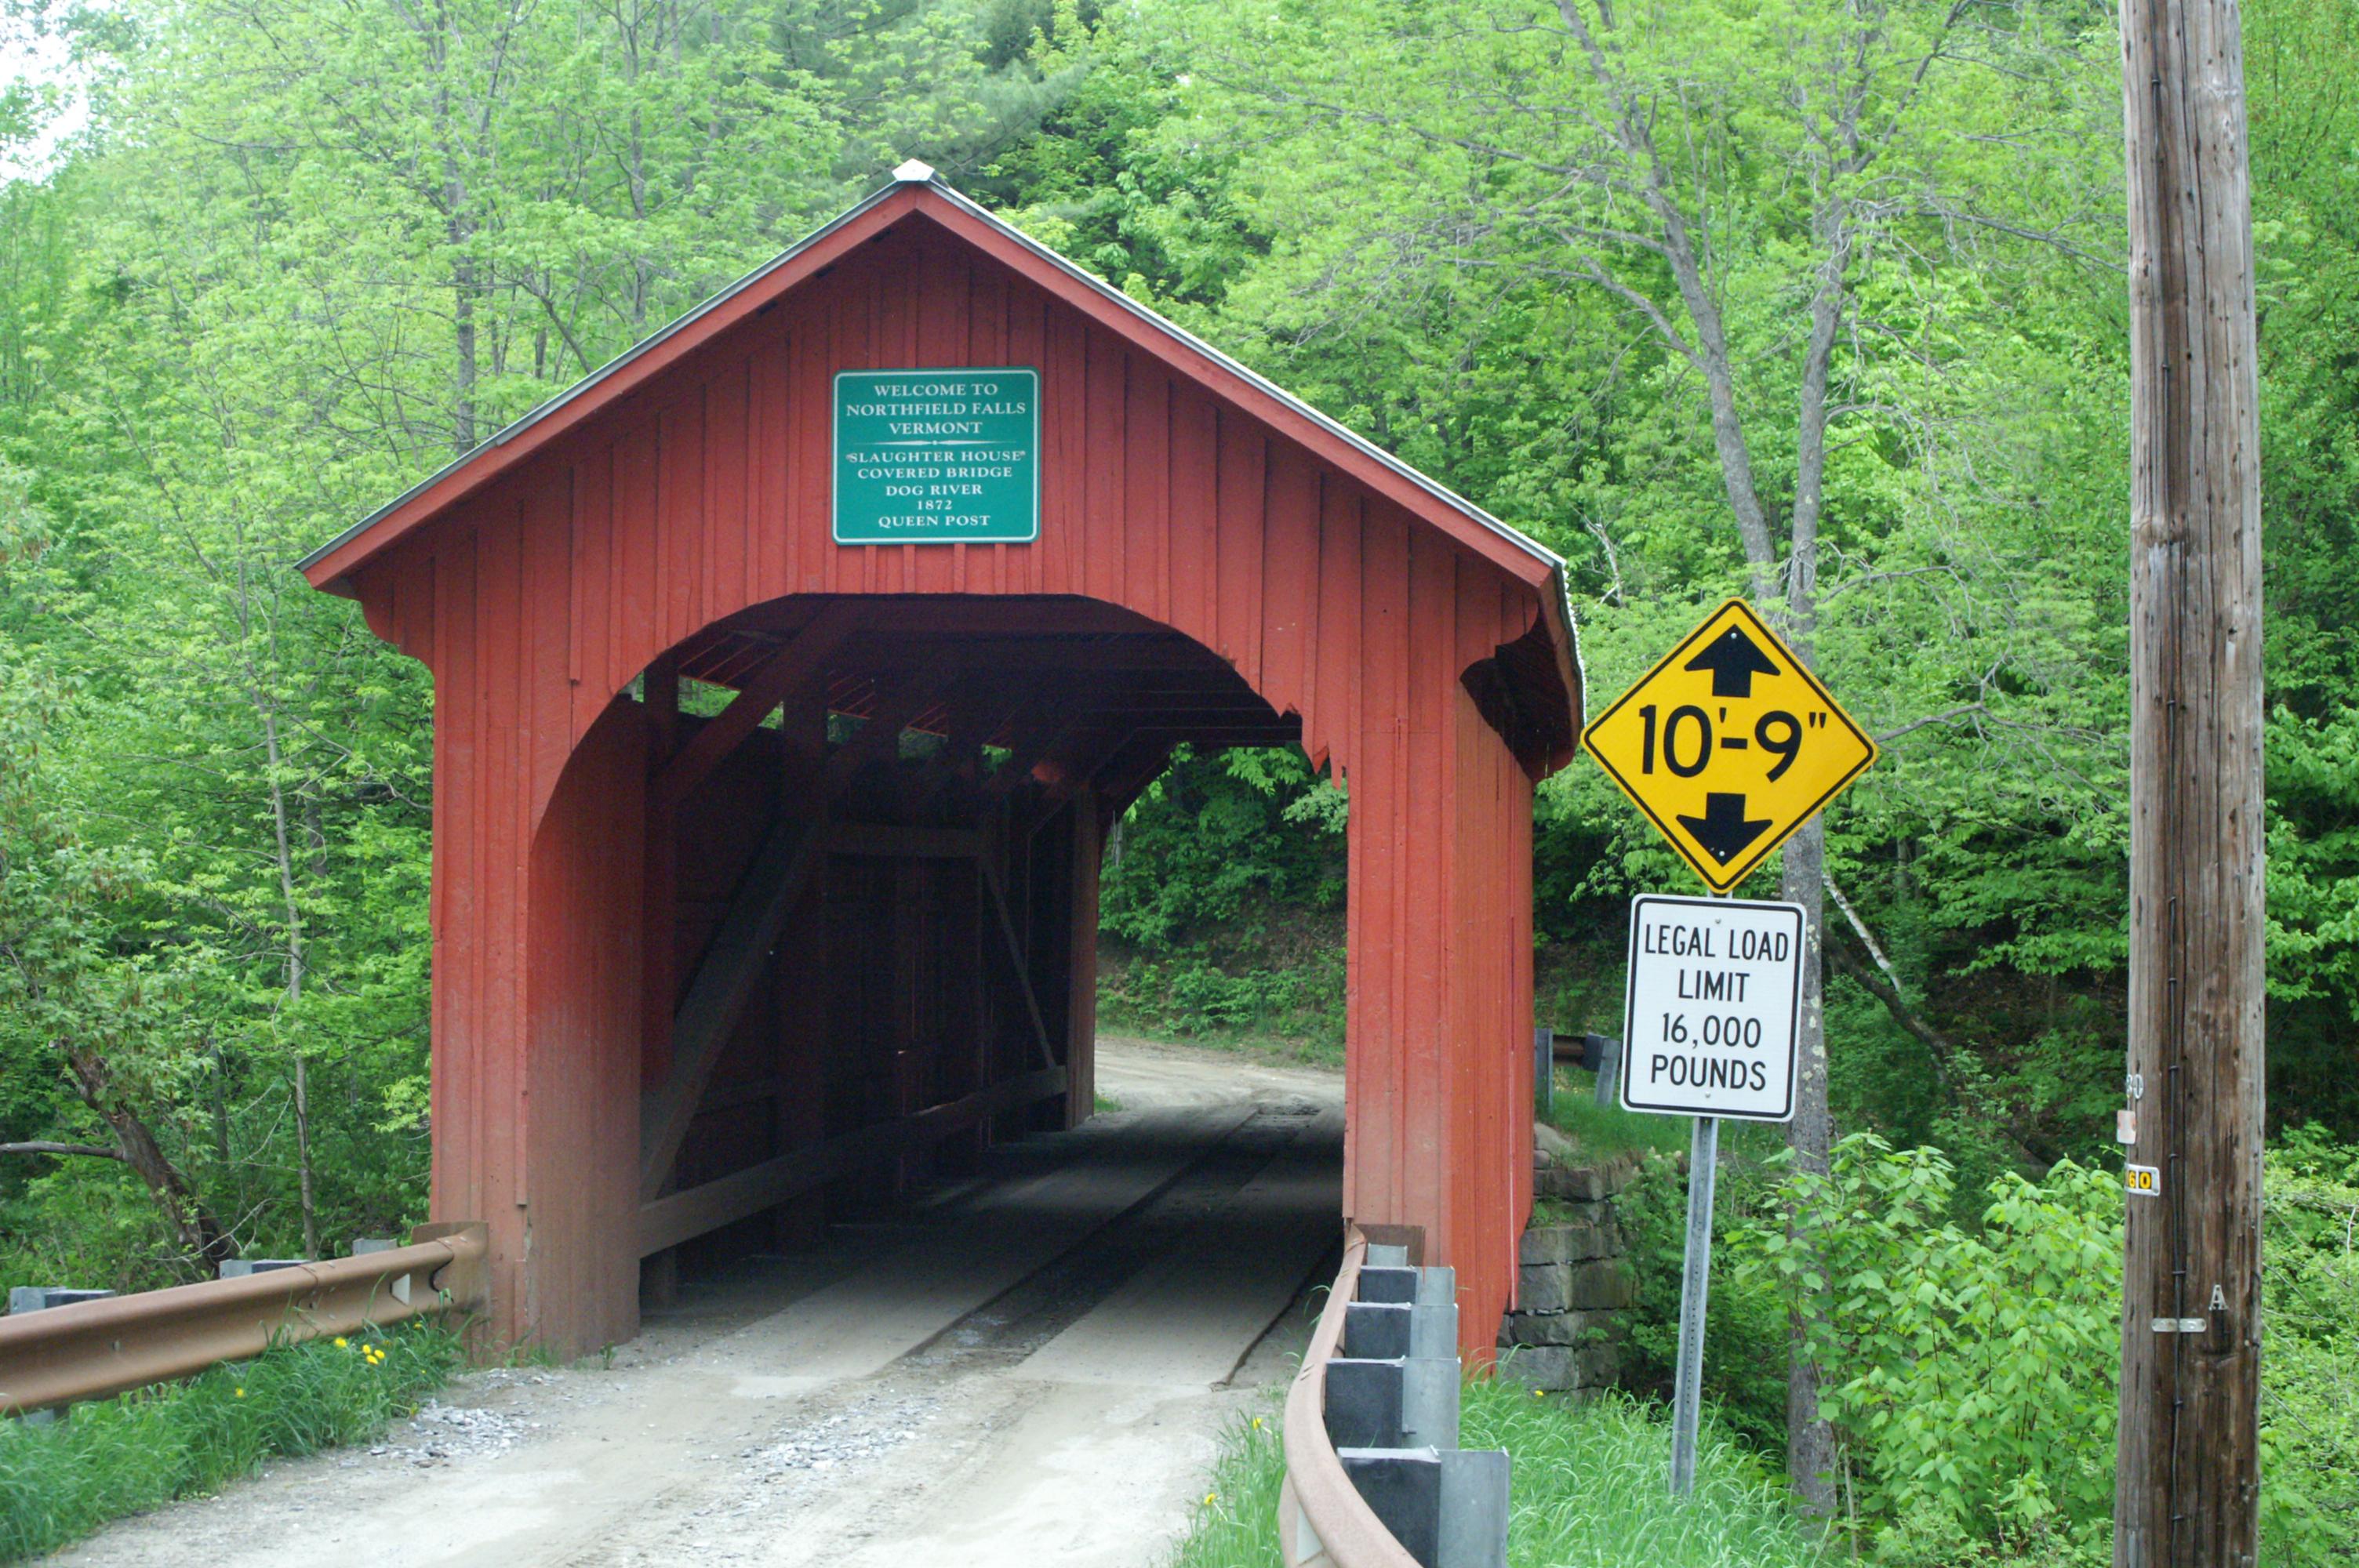 Slaughter House Covered Bridge